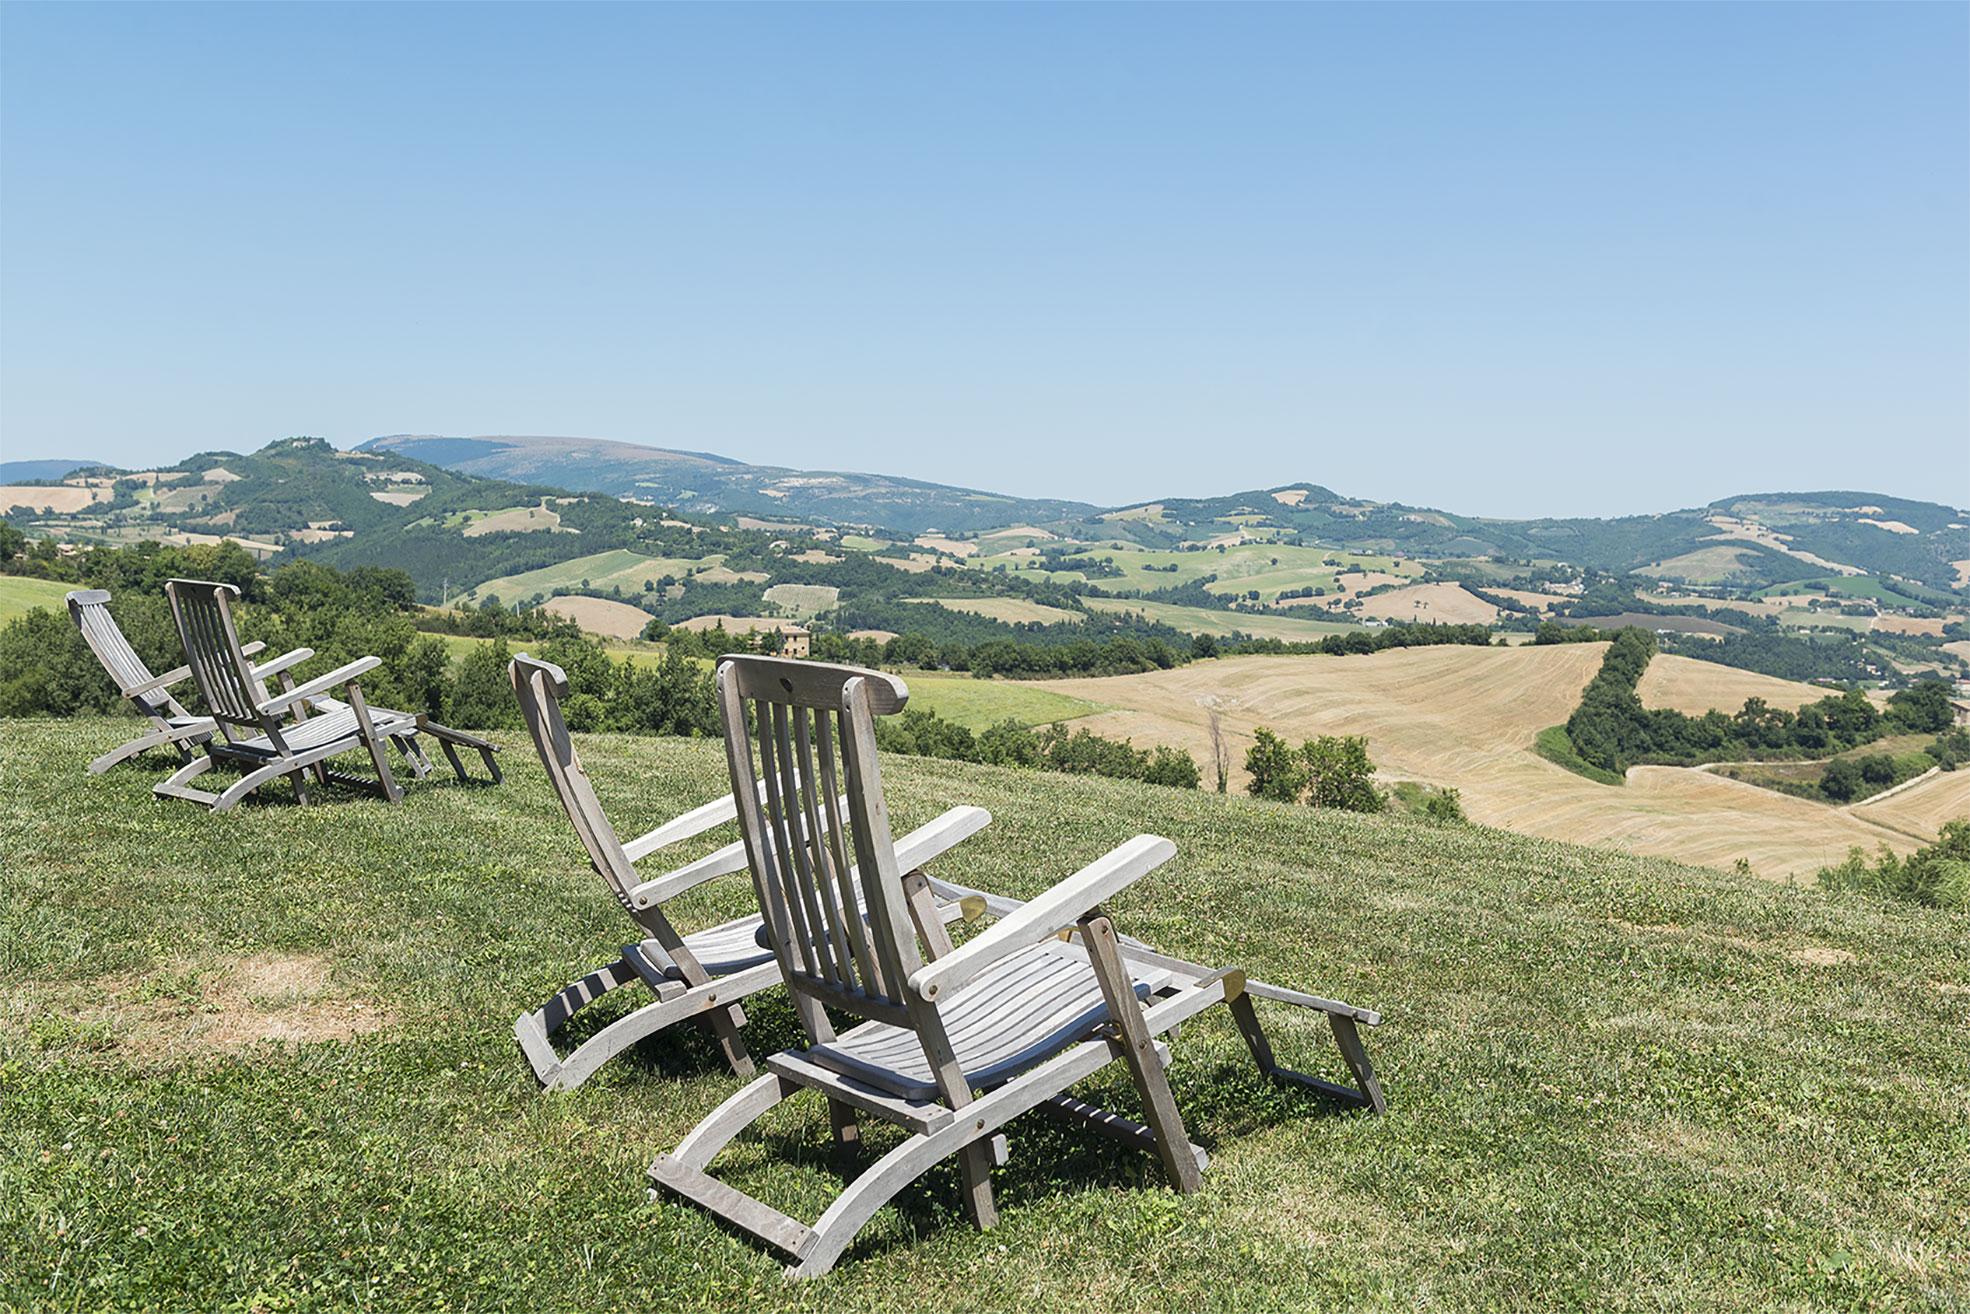 View of the marche hills from Malatetsa Maison de Charme Photographer Maria Teresa Furnari